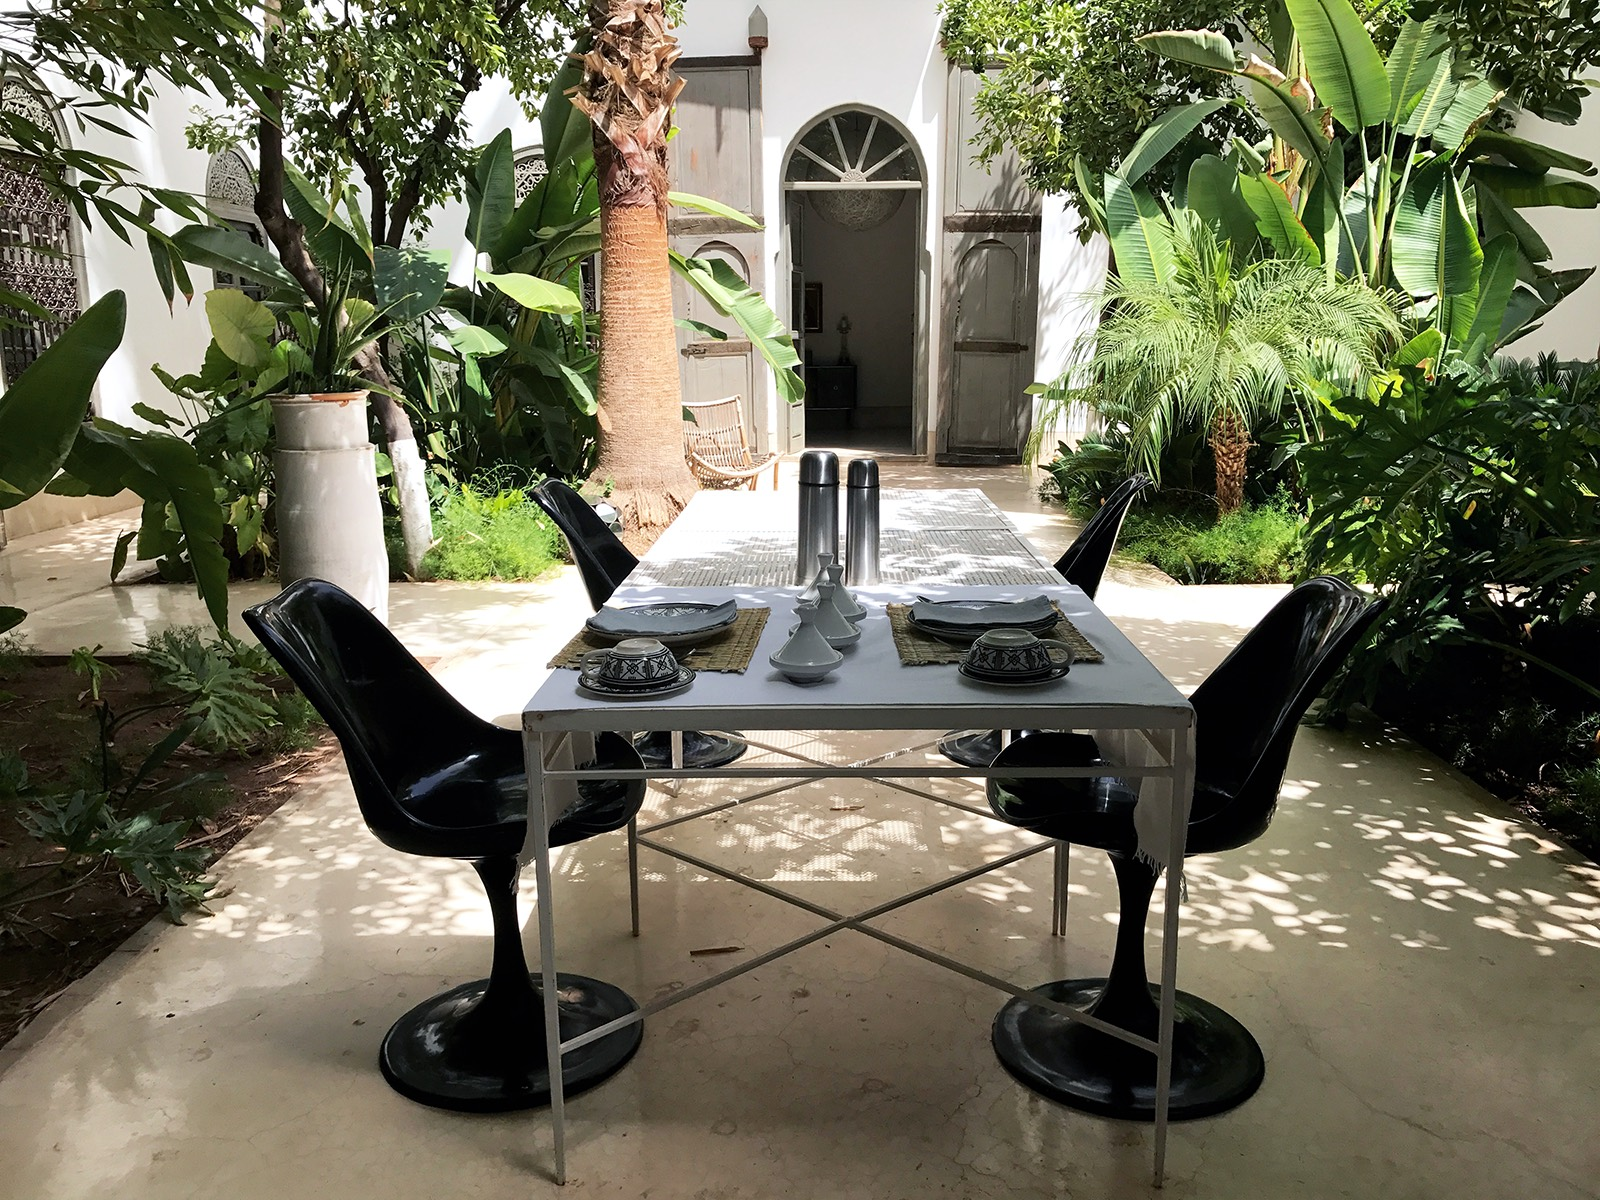 Marrakesh-Riad-Be-Mena-courtyard-breakfast.jpg